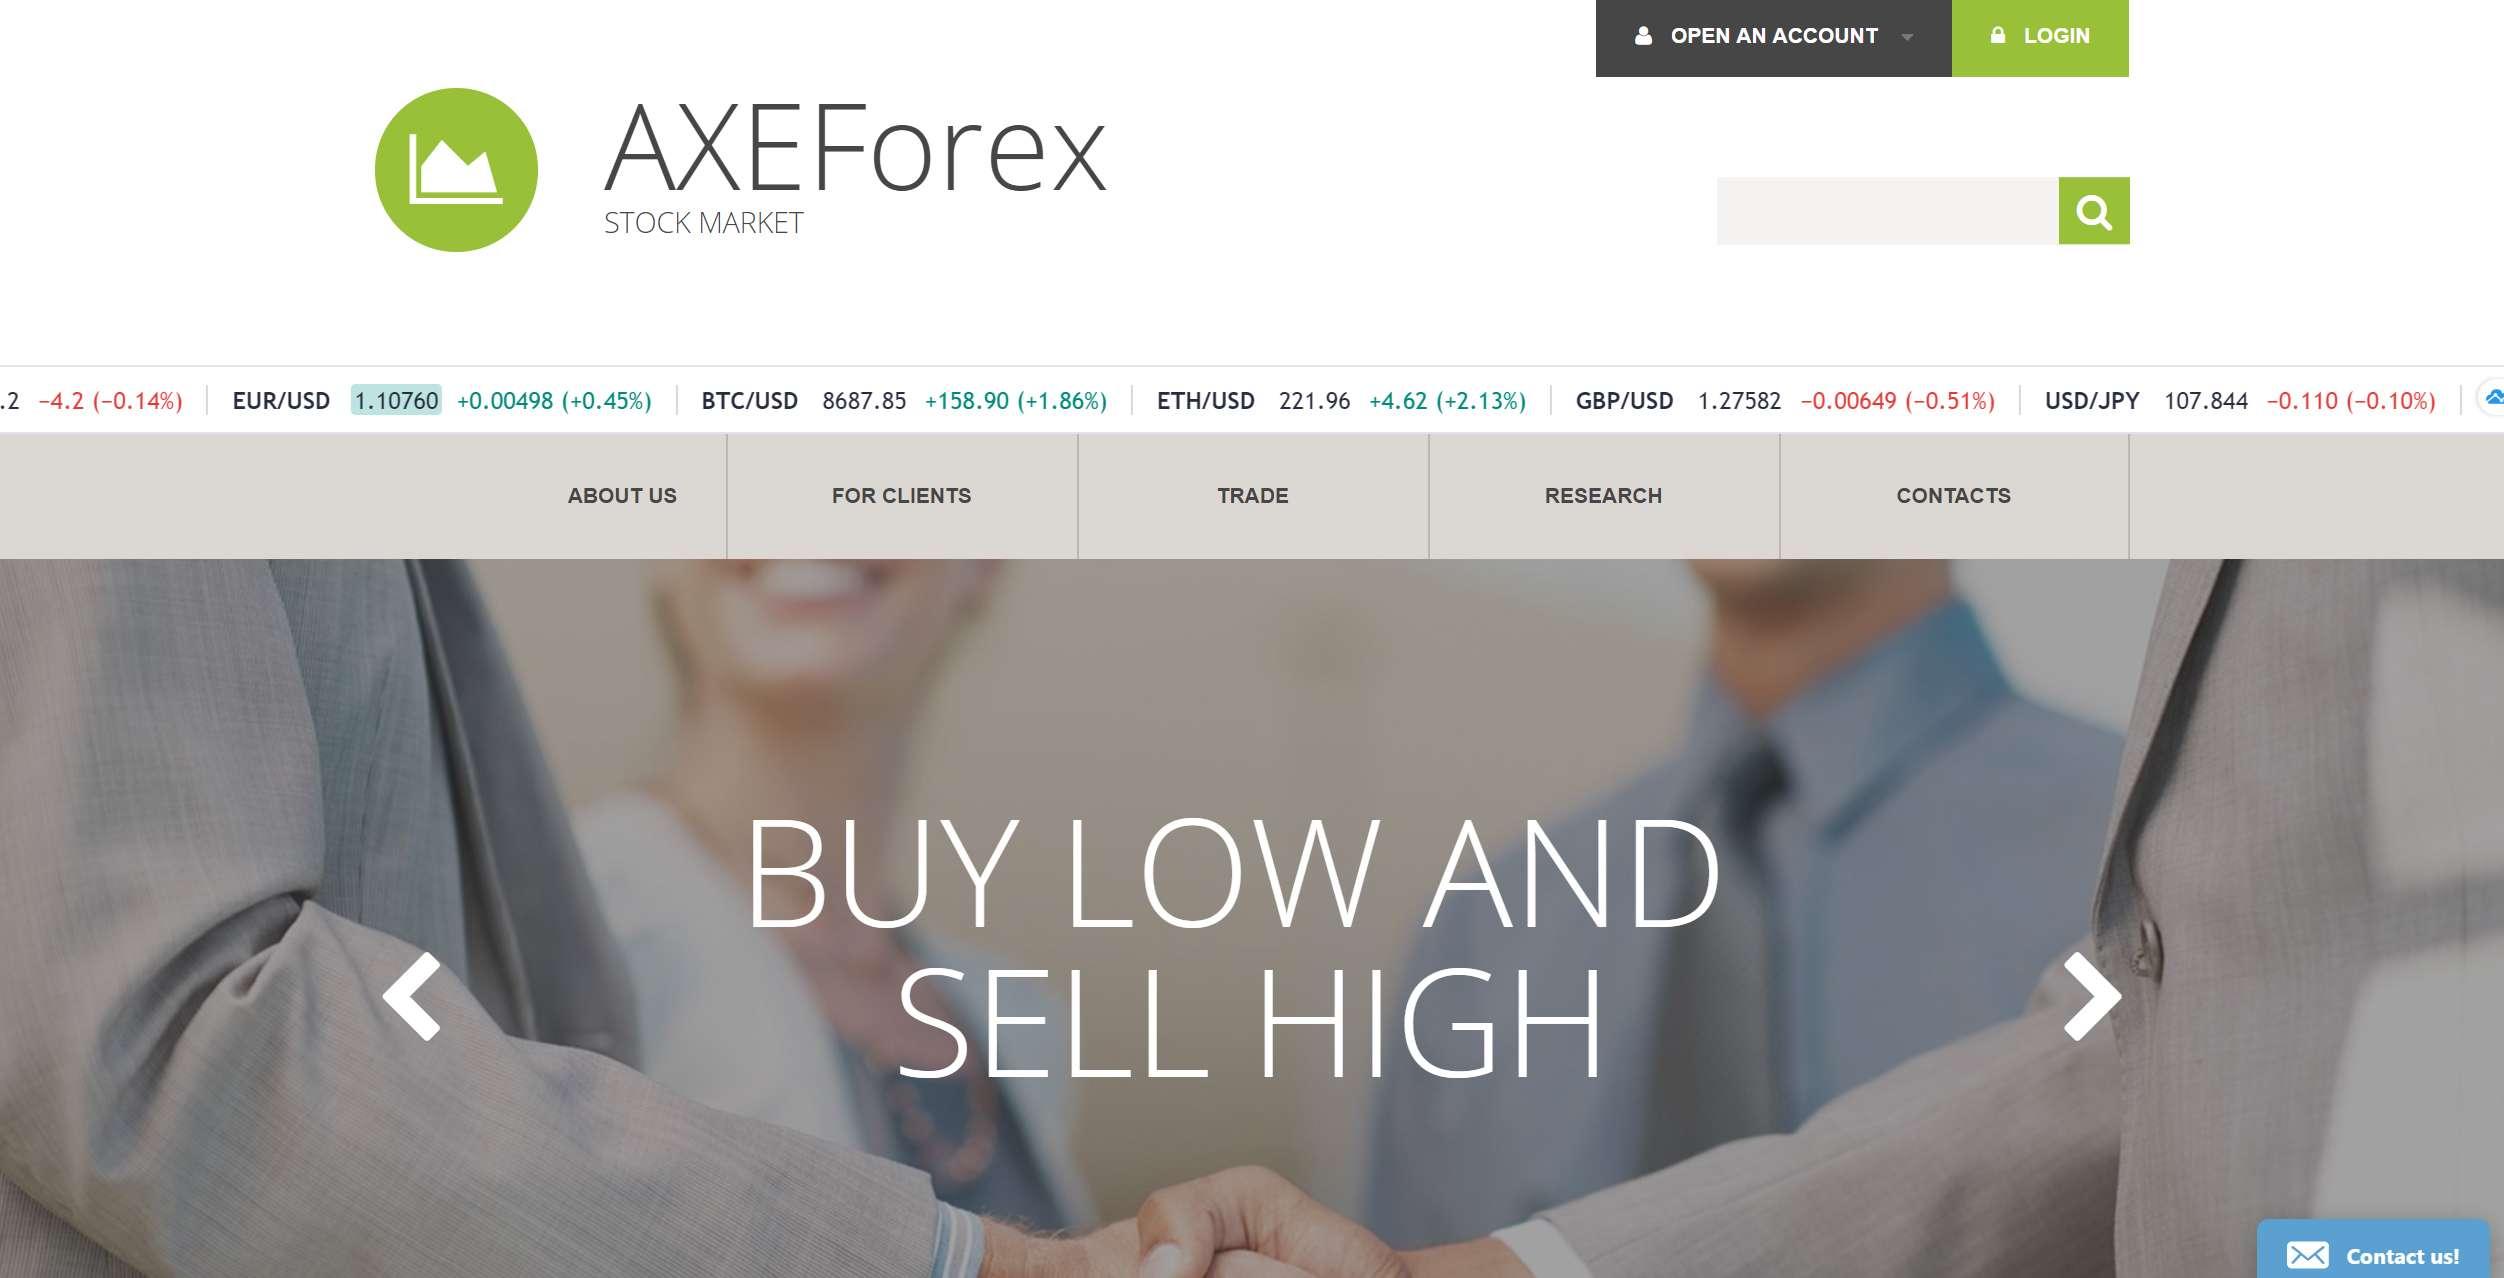 Обзор Axeforex - снова развод? Наше мнение о проекте.